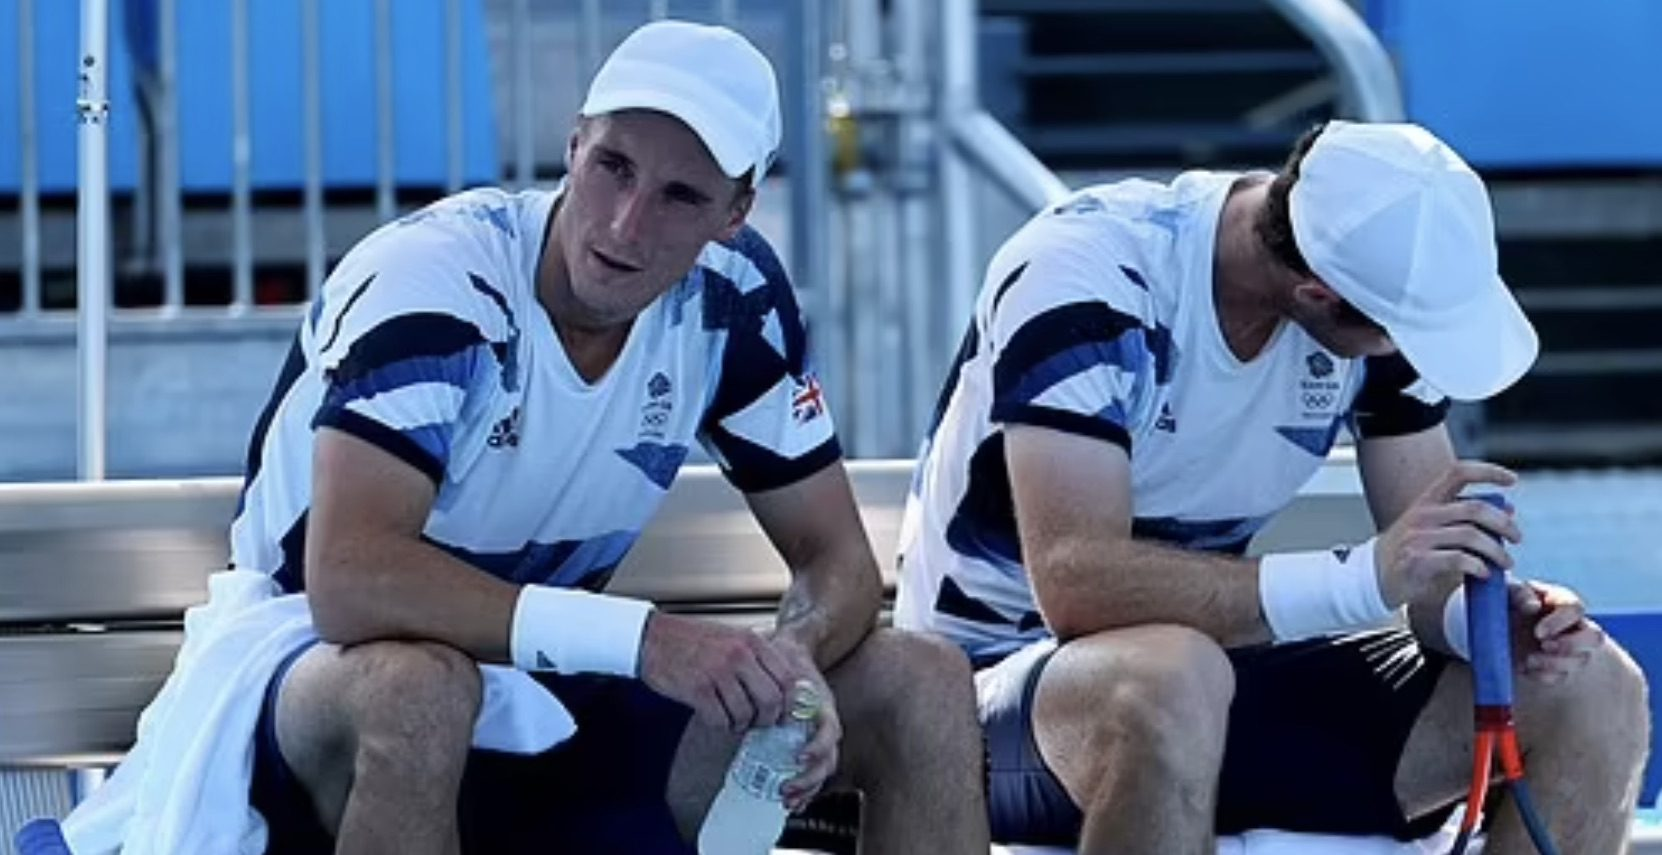 Andy Murray and doubles partner Joe Salisbury lose in Tokyo